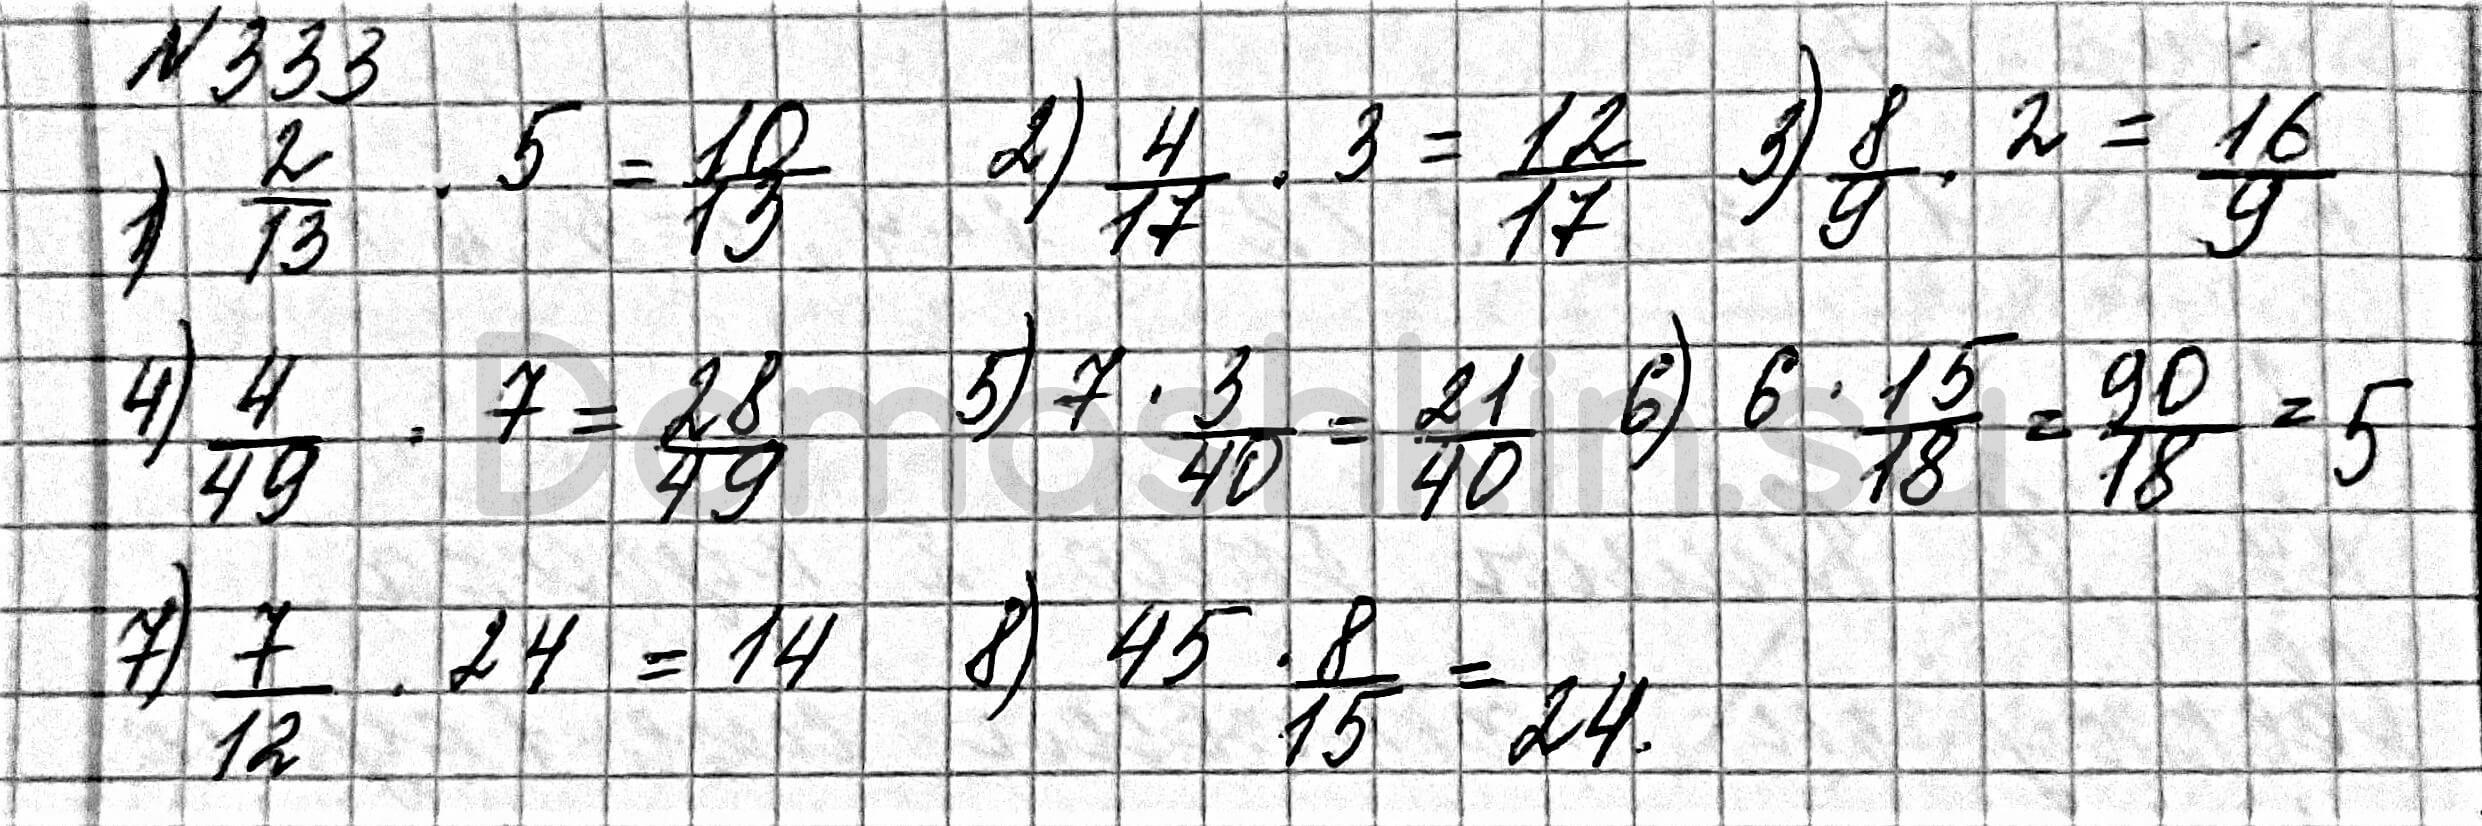 Математика 6 класс учебник Мерзляк номер 333 решение